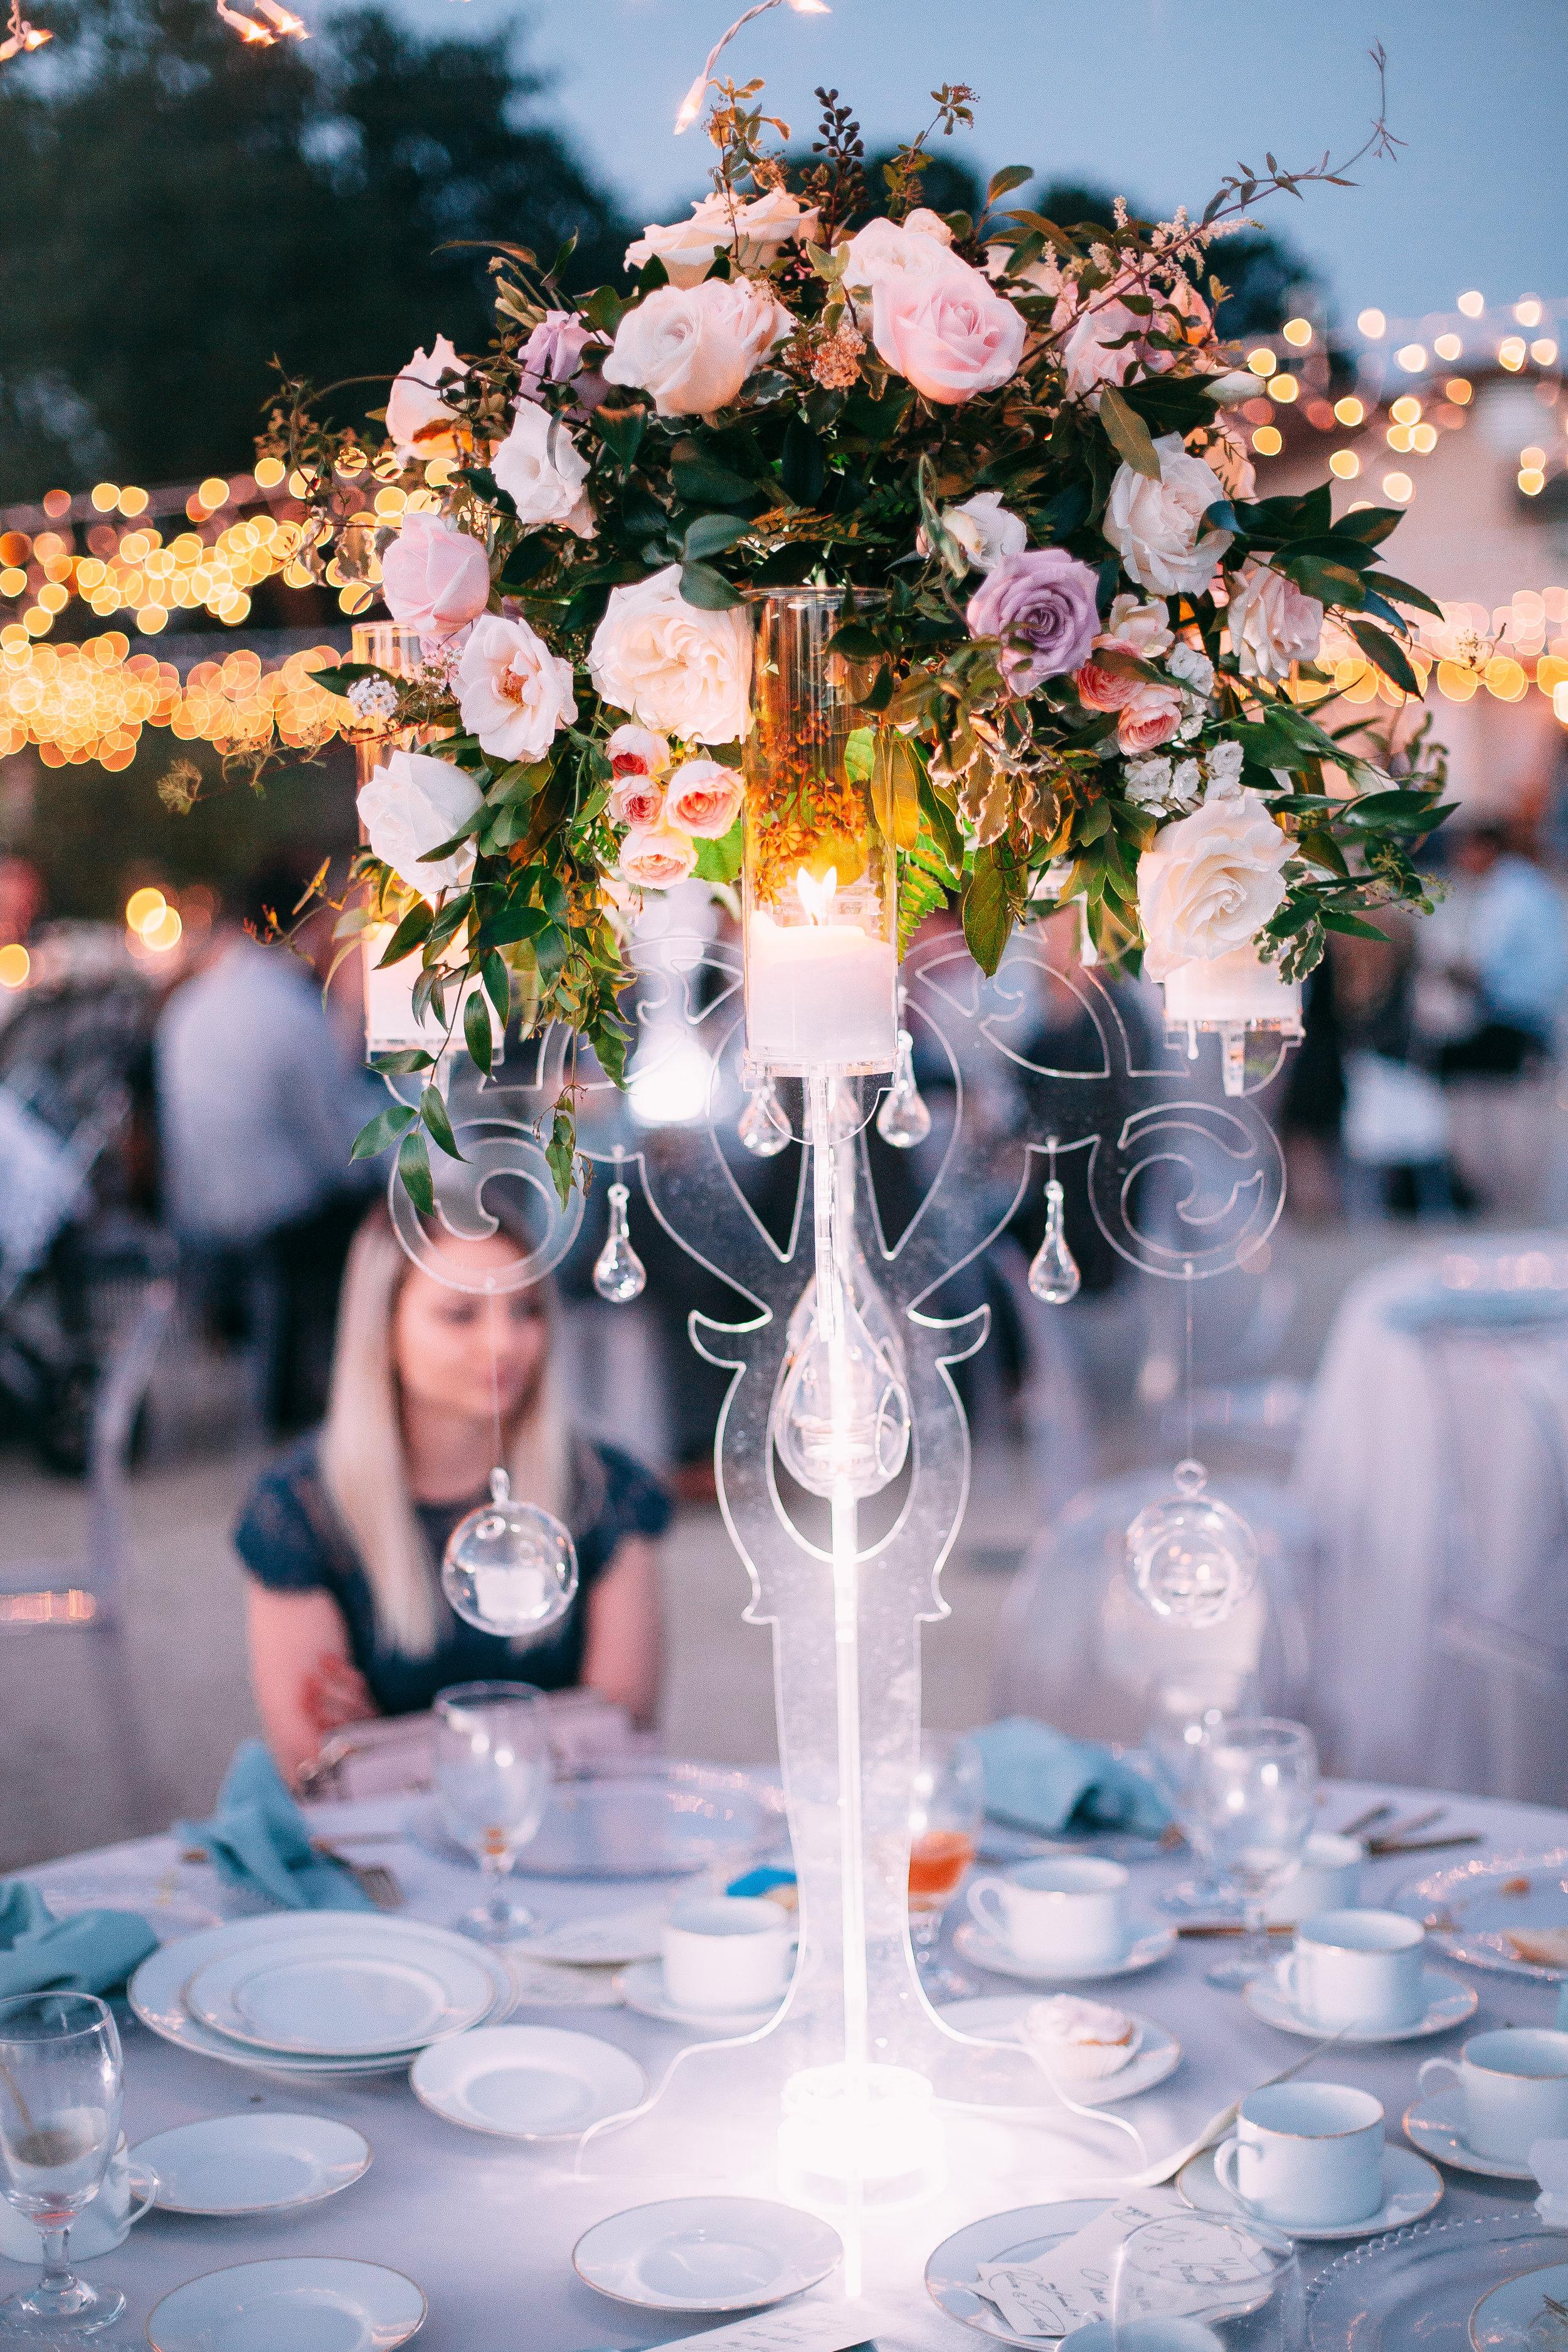 Violette-fleurs-event-design-roseville-anna-perevertaylo-rancho-robles-vinyards-Detail-Classic-Beautiful-Bliss-centerpiece-clear-acrylic.jpg